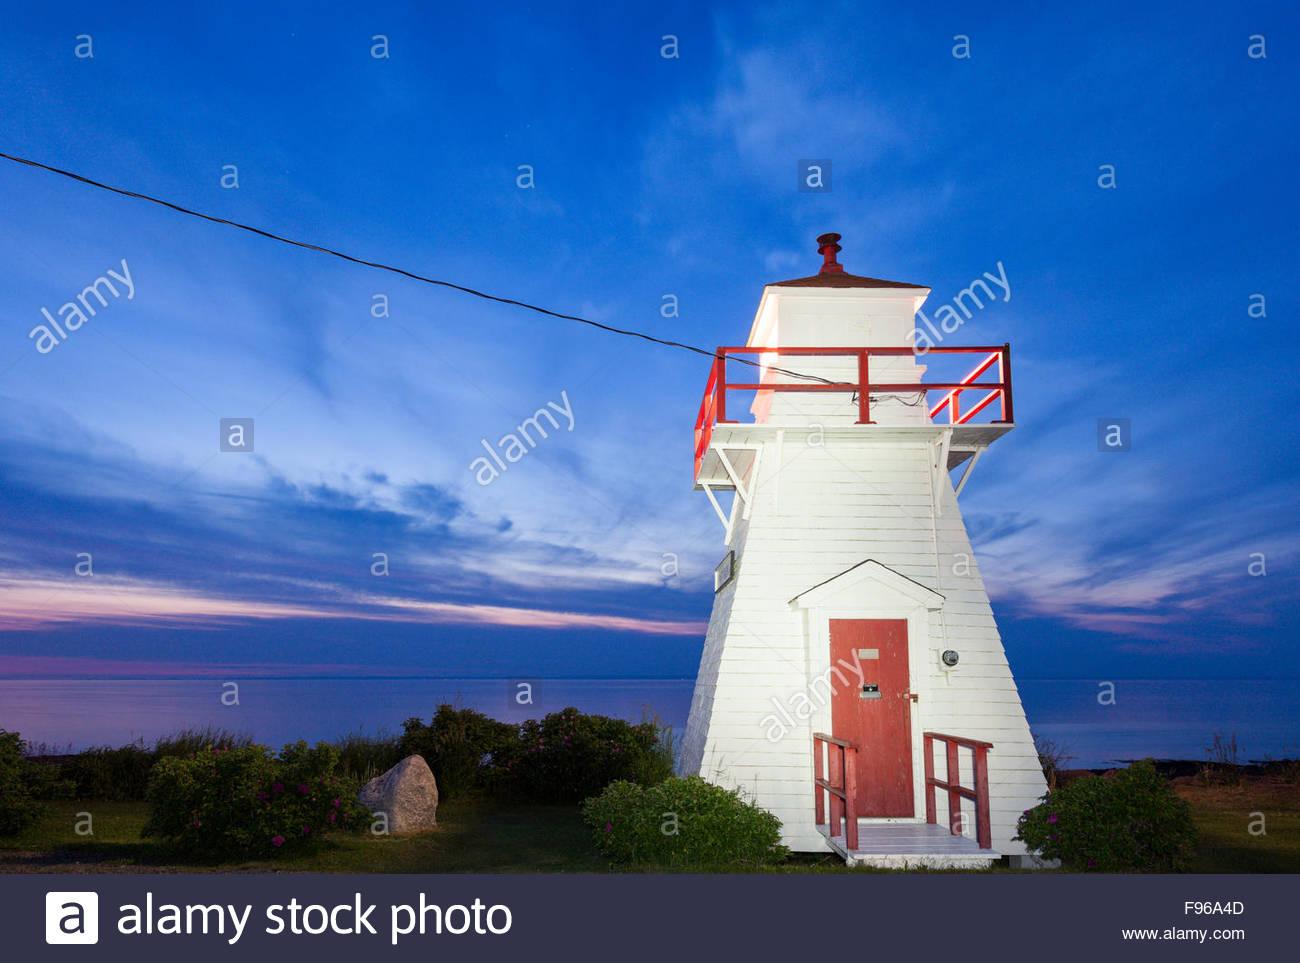 Port George Lighthouse in Nova Scottia - Stock Image